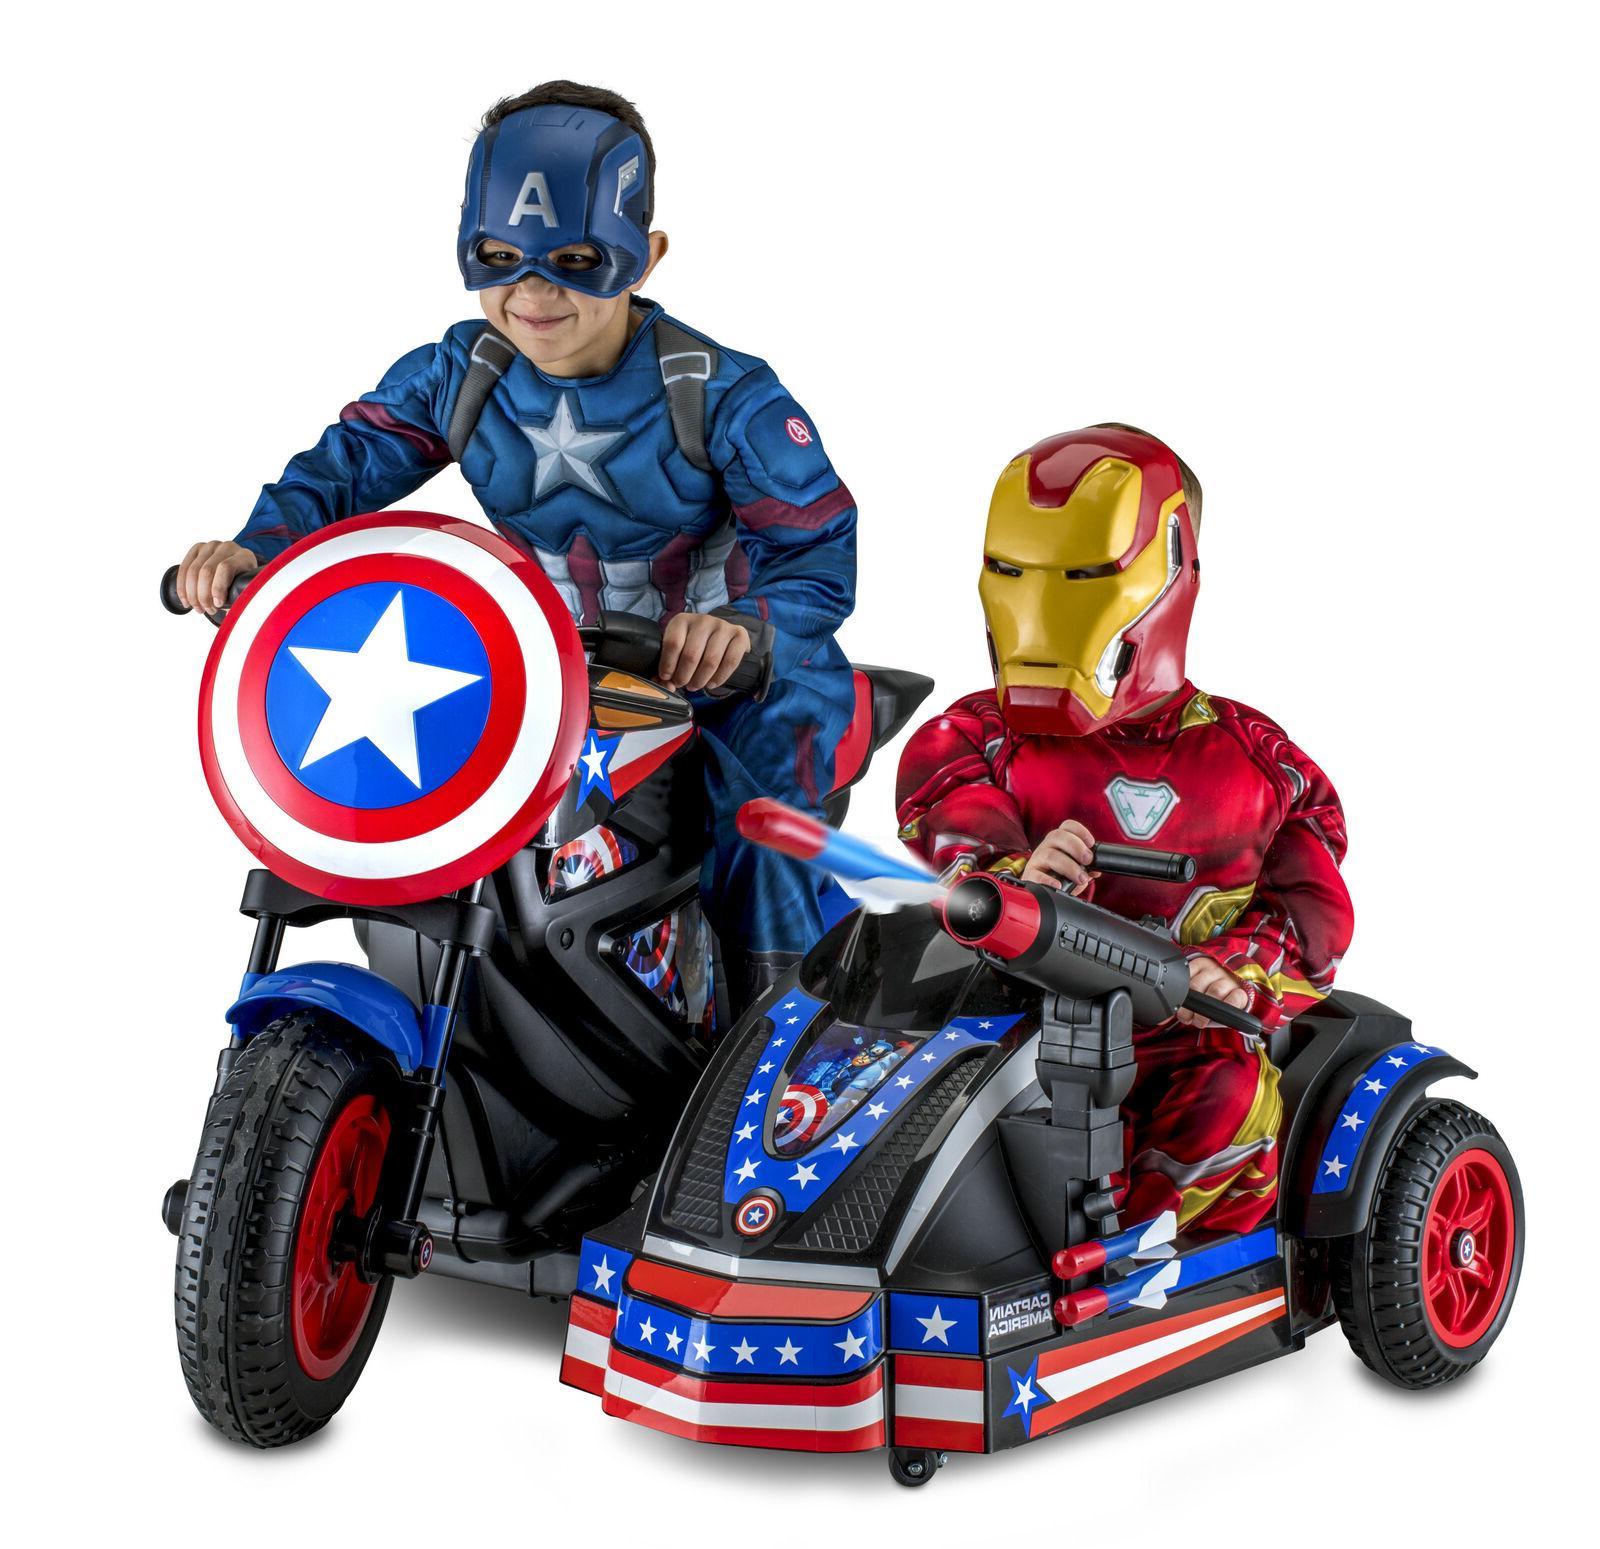 captain america motorcycle sidecar kid ride on